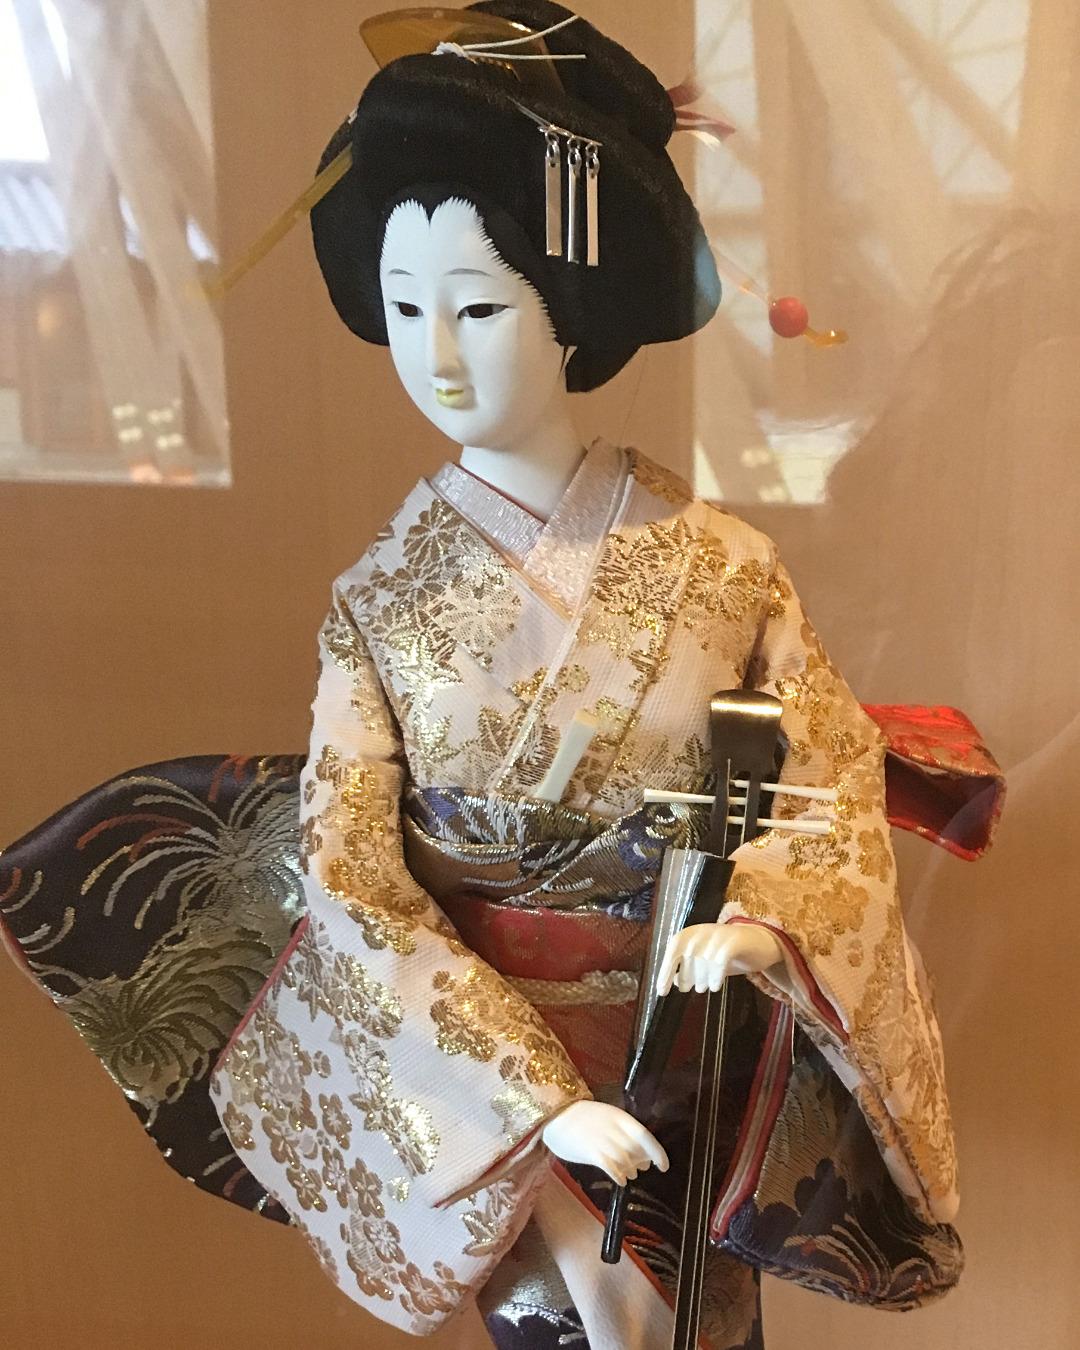 A sangen-playing geisha doll, by Aaron Mannino